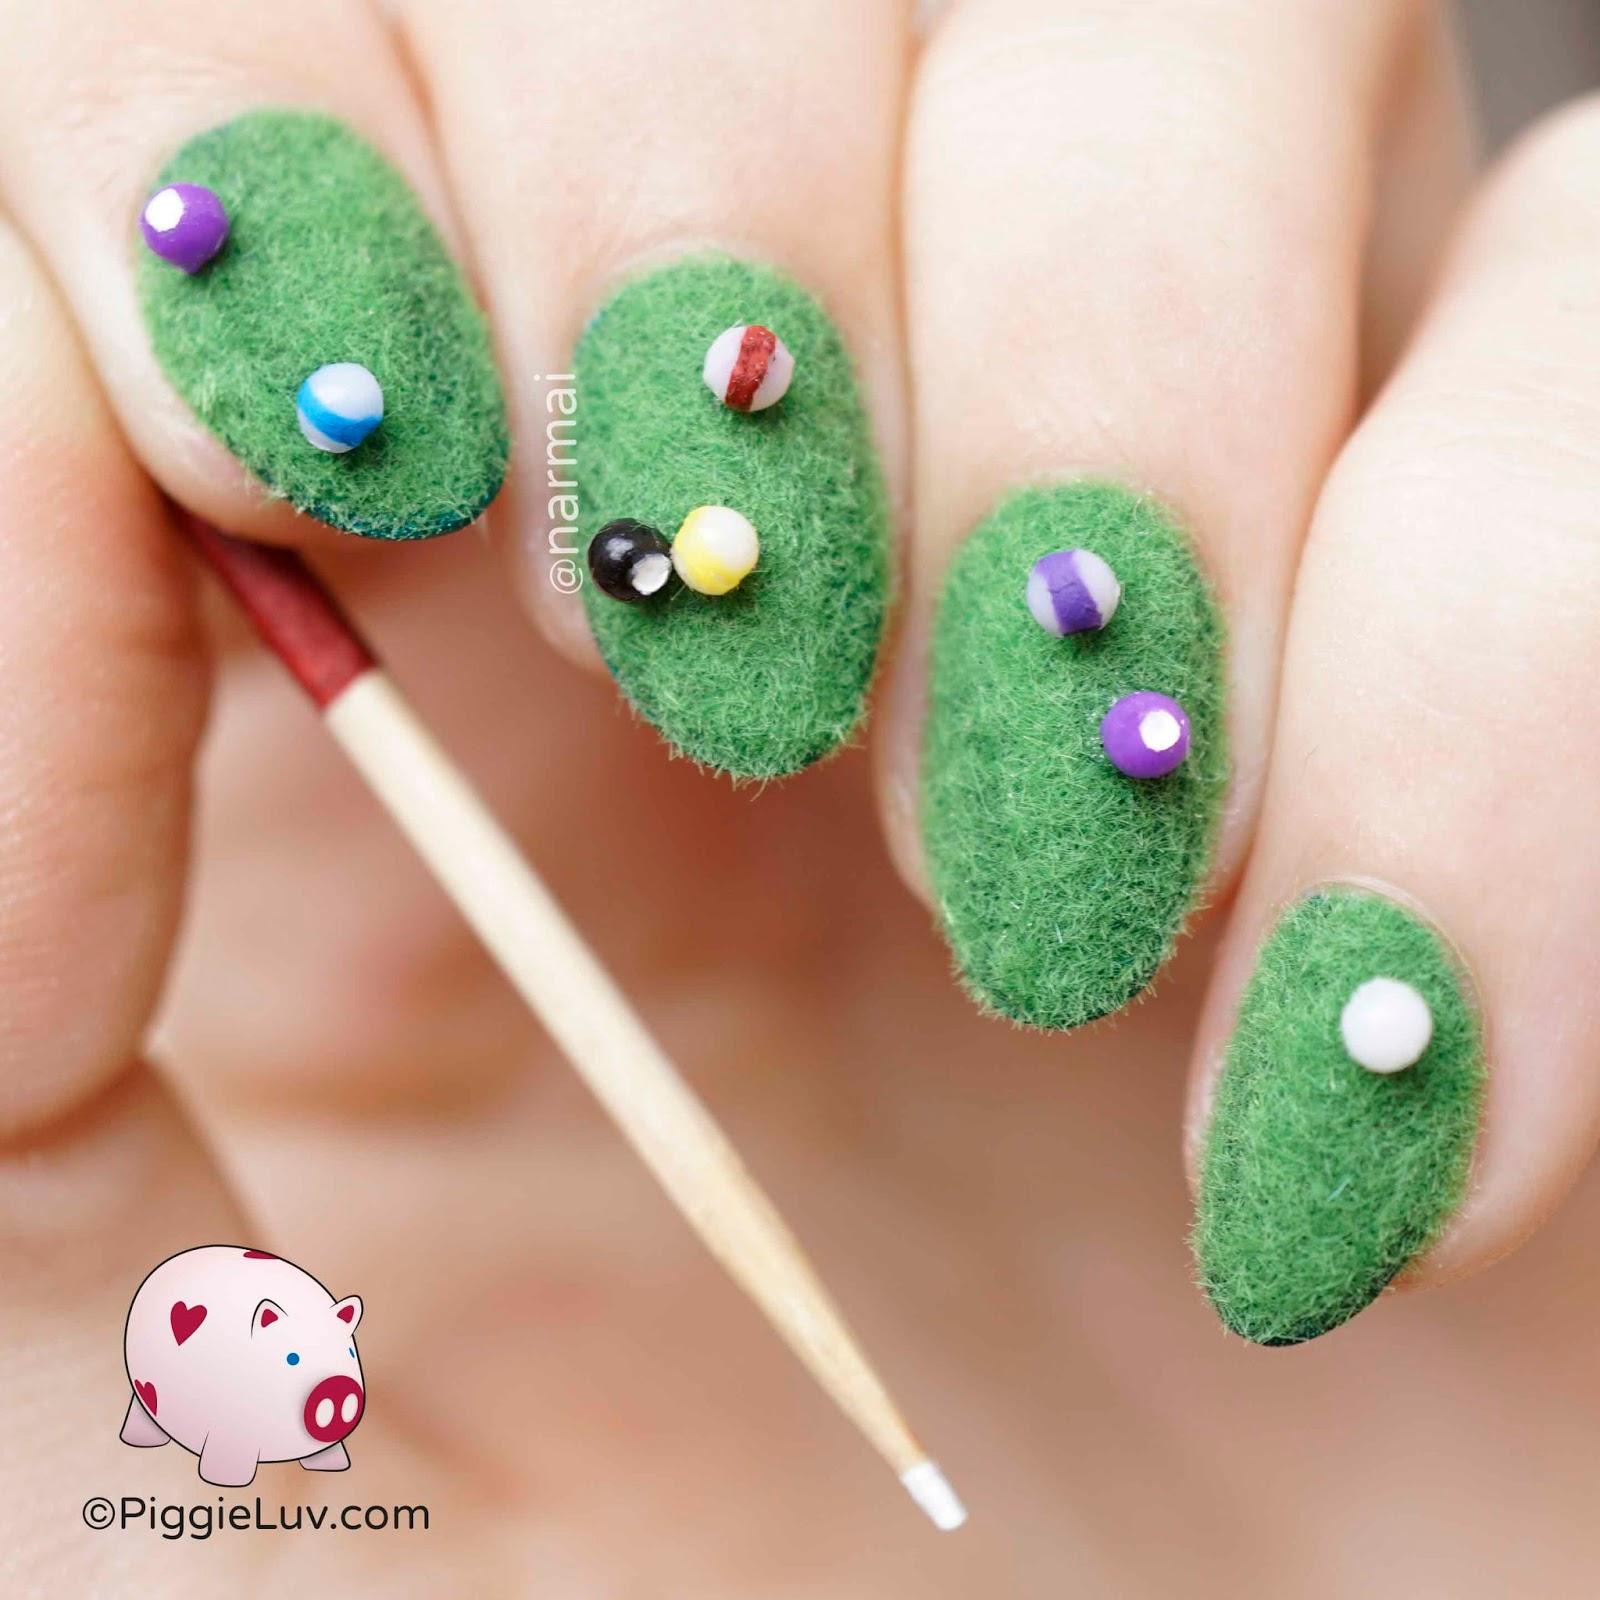 PiggieLuv: Pool table nail art